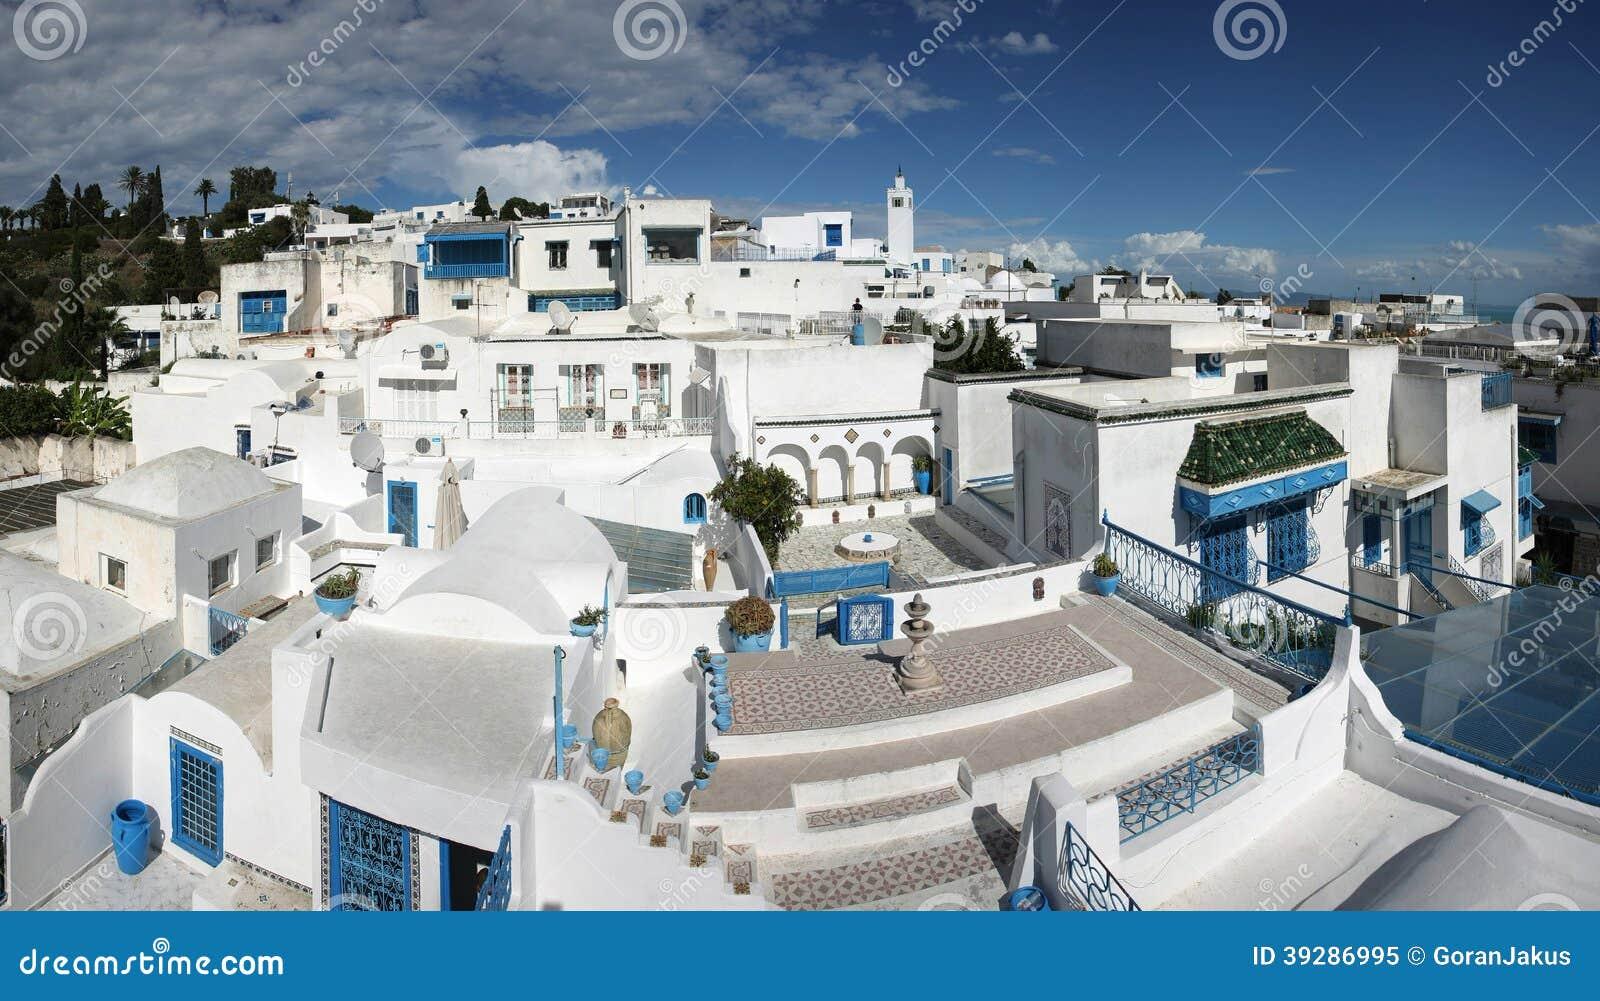 Design Home Plans Sidi Bou Said Panorama Stock Photo Image 39286995